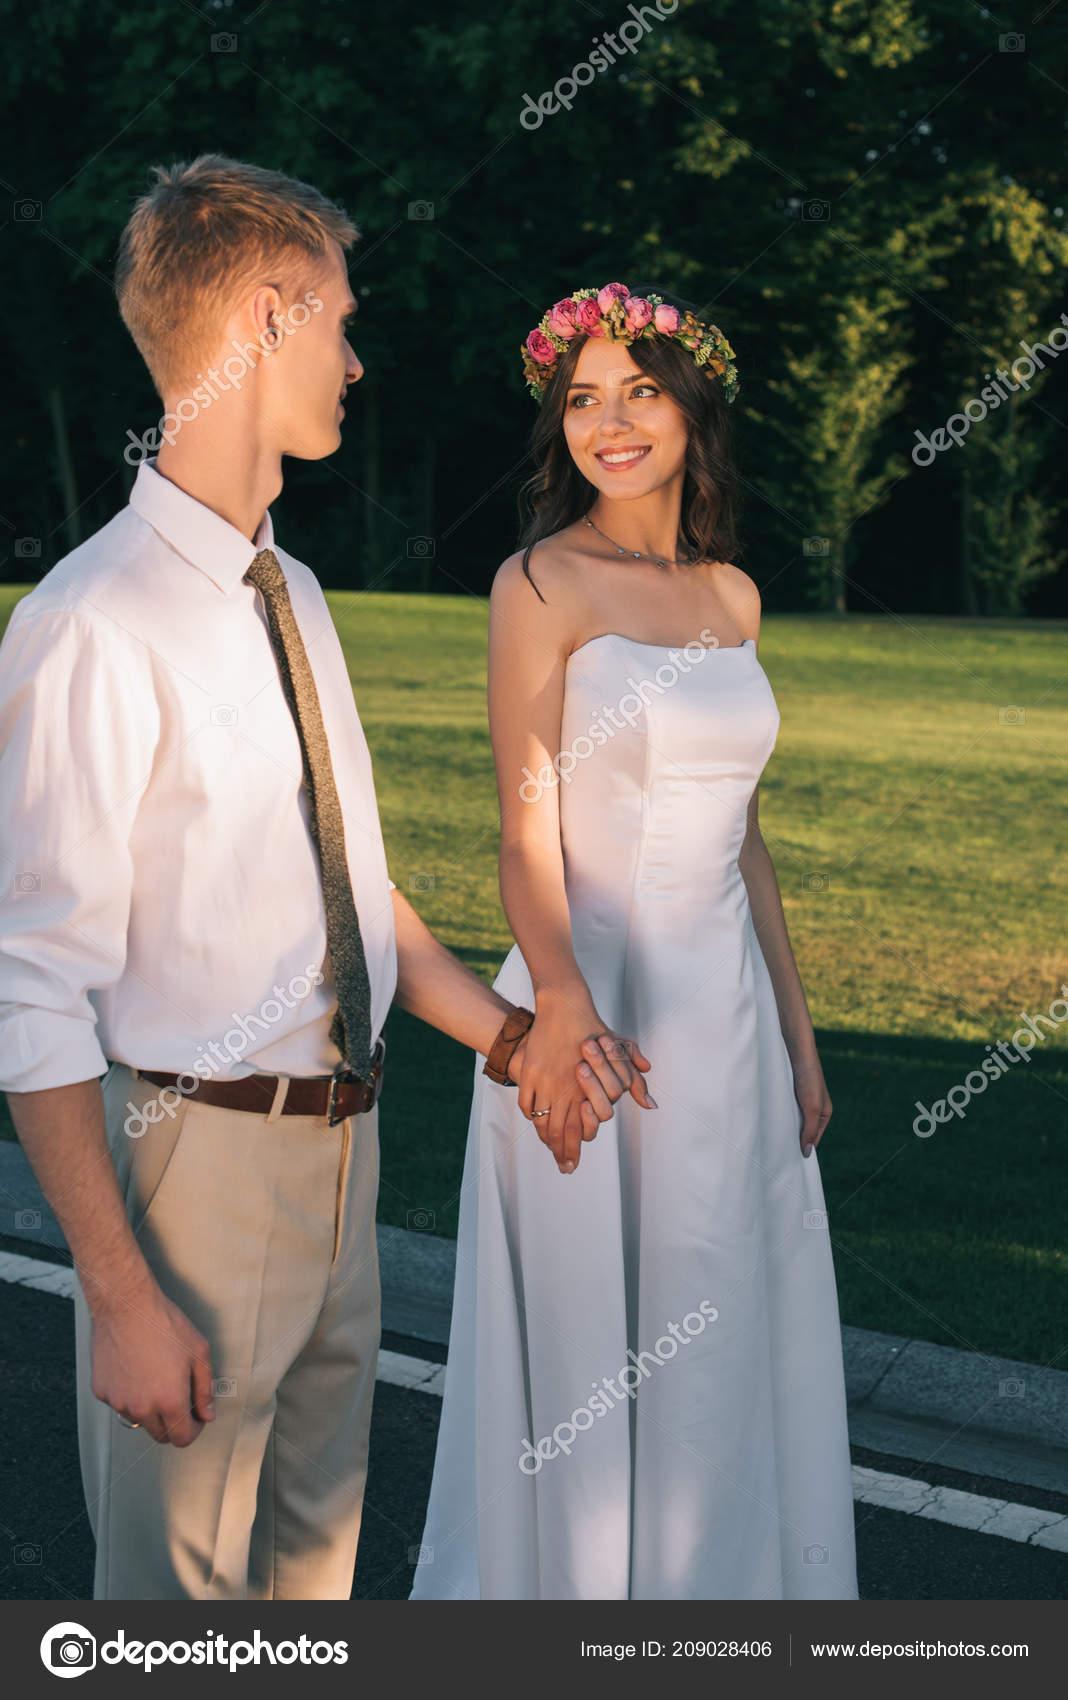 Beautiful Romantic Young Wedding Couple Smiling Each Other Walking Together Stock Photo C Igorvetushko 209028406